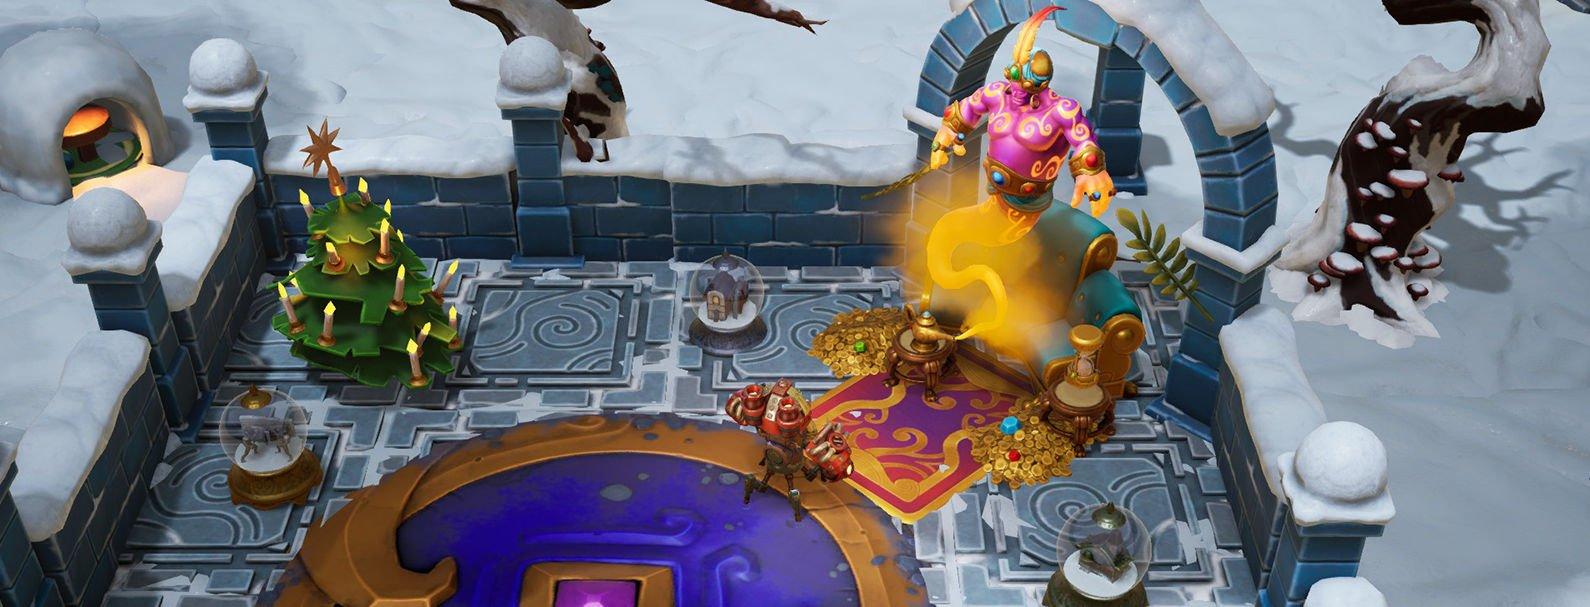 Torchlight 3 nuove opzioni per i dungeon di Fazeer